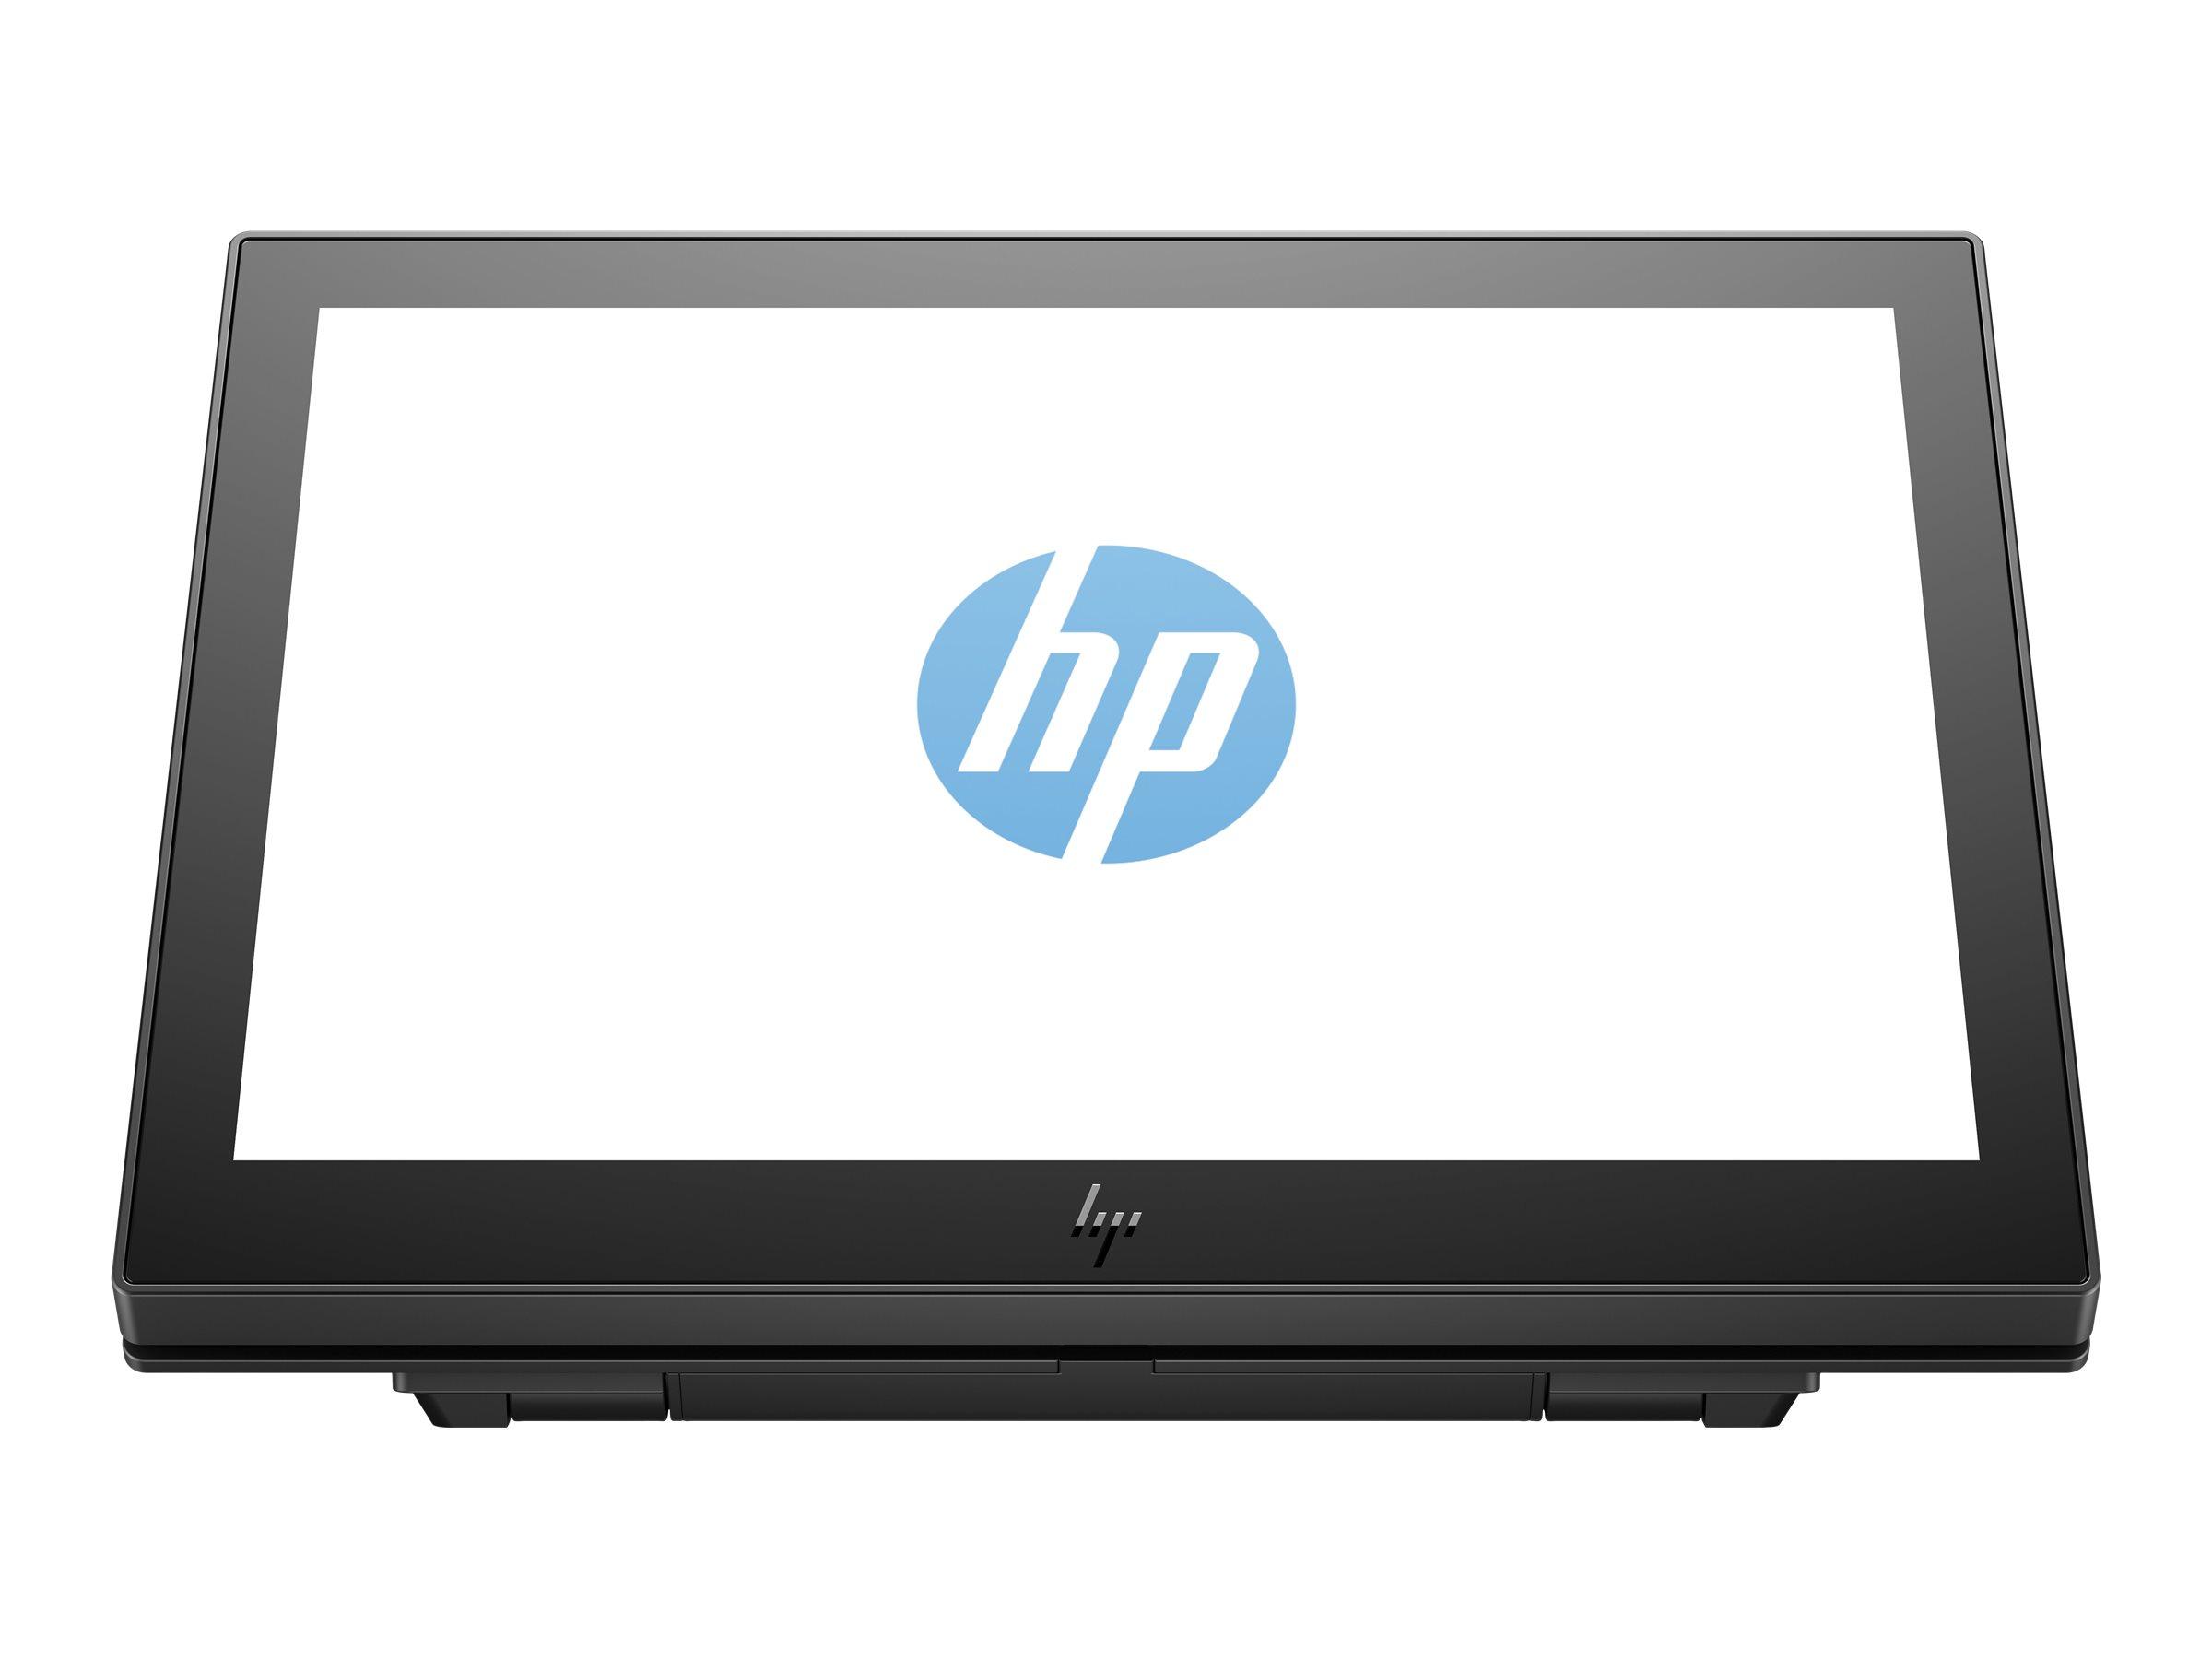 HP Engage One - Kundenanzeige - 25.7 cm (10.1